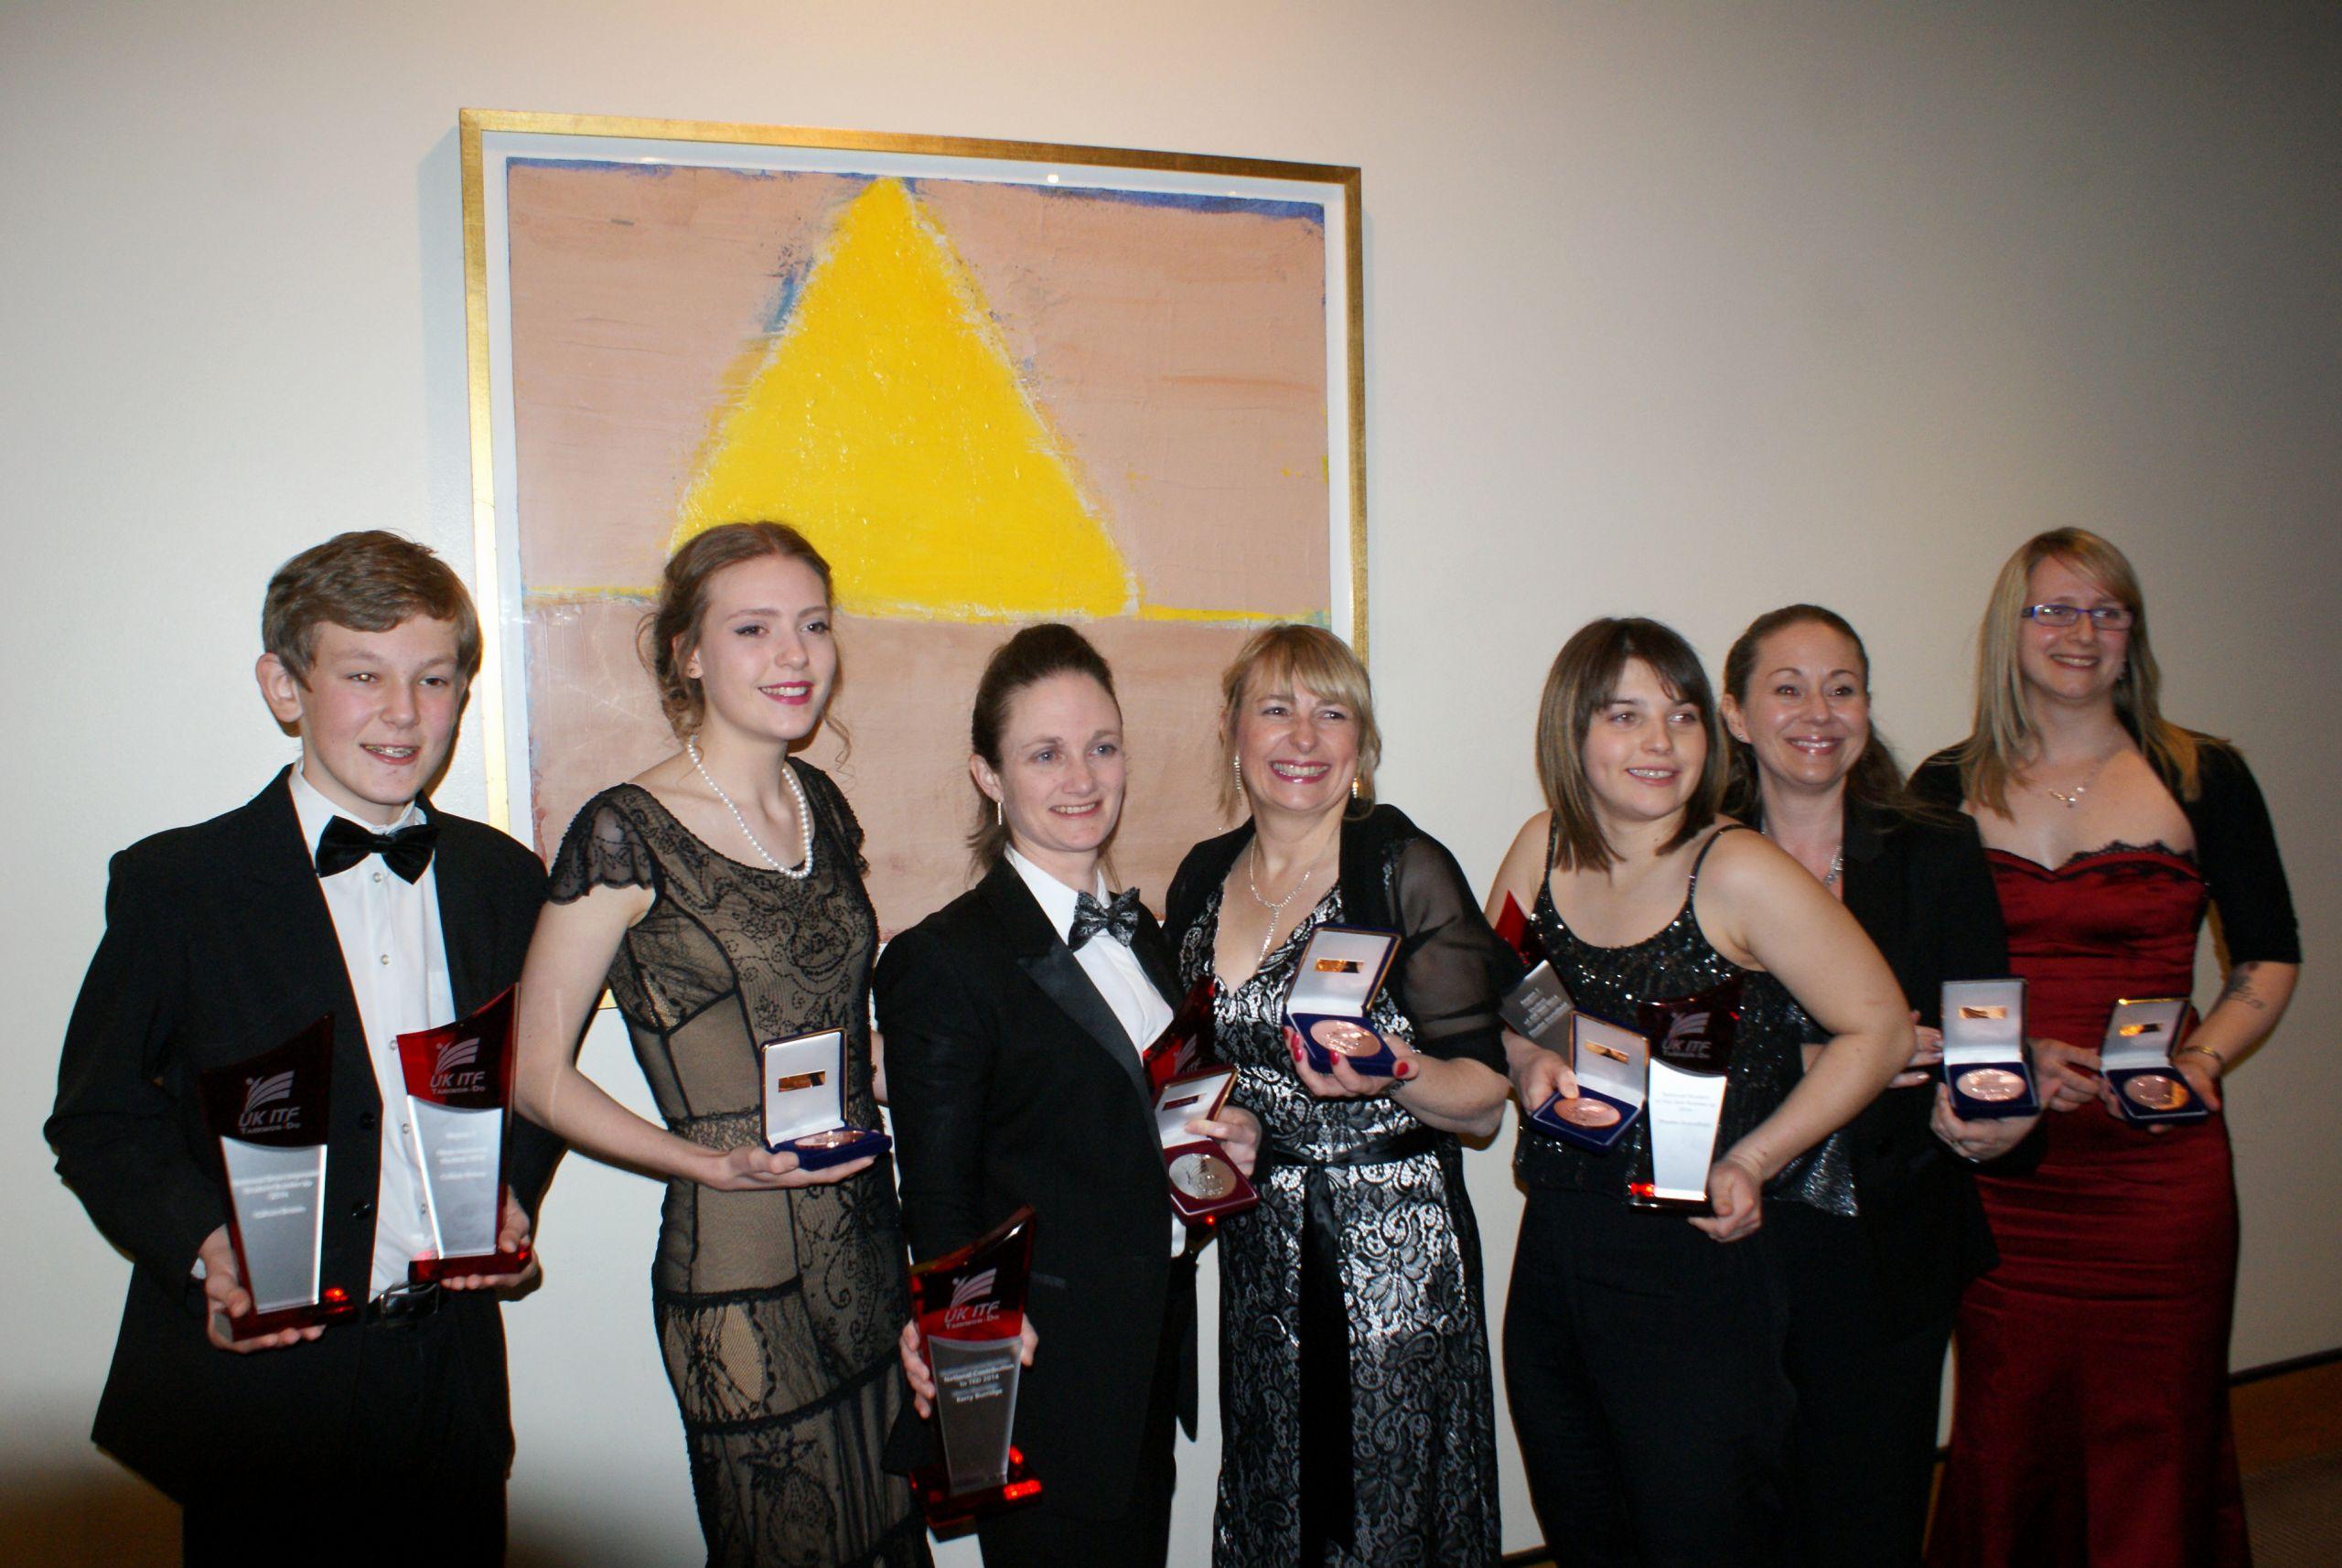 Most Improved Student Award Speech Inspirational Uk Training Day & Awards evening